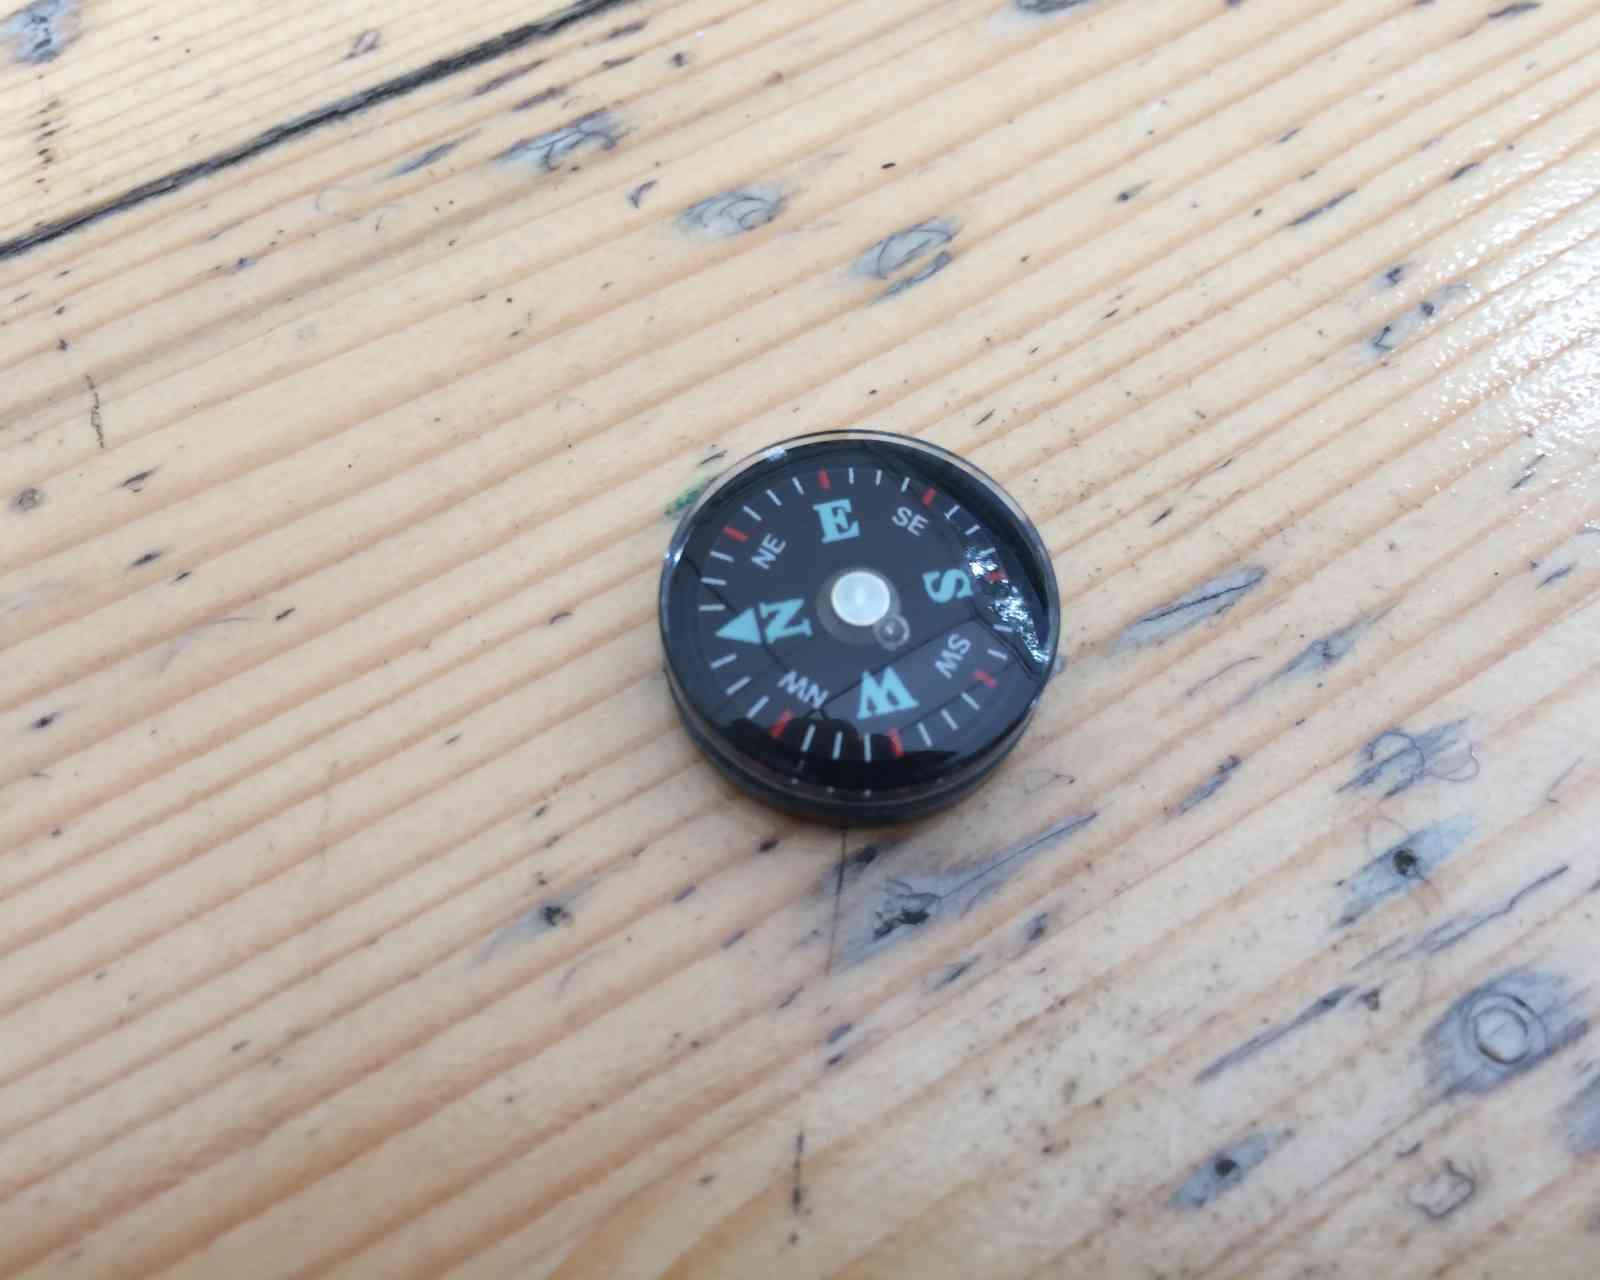 Unauffälliges EDC - Knopfkompass